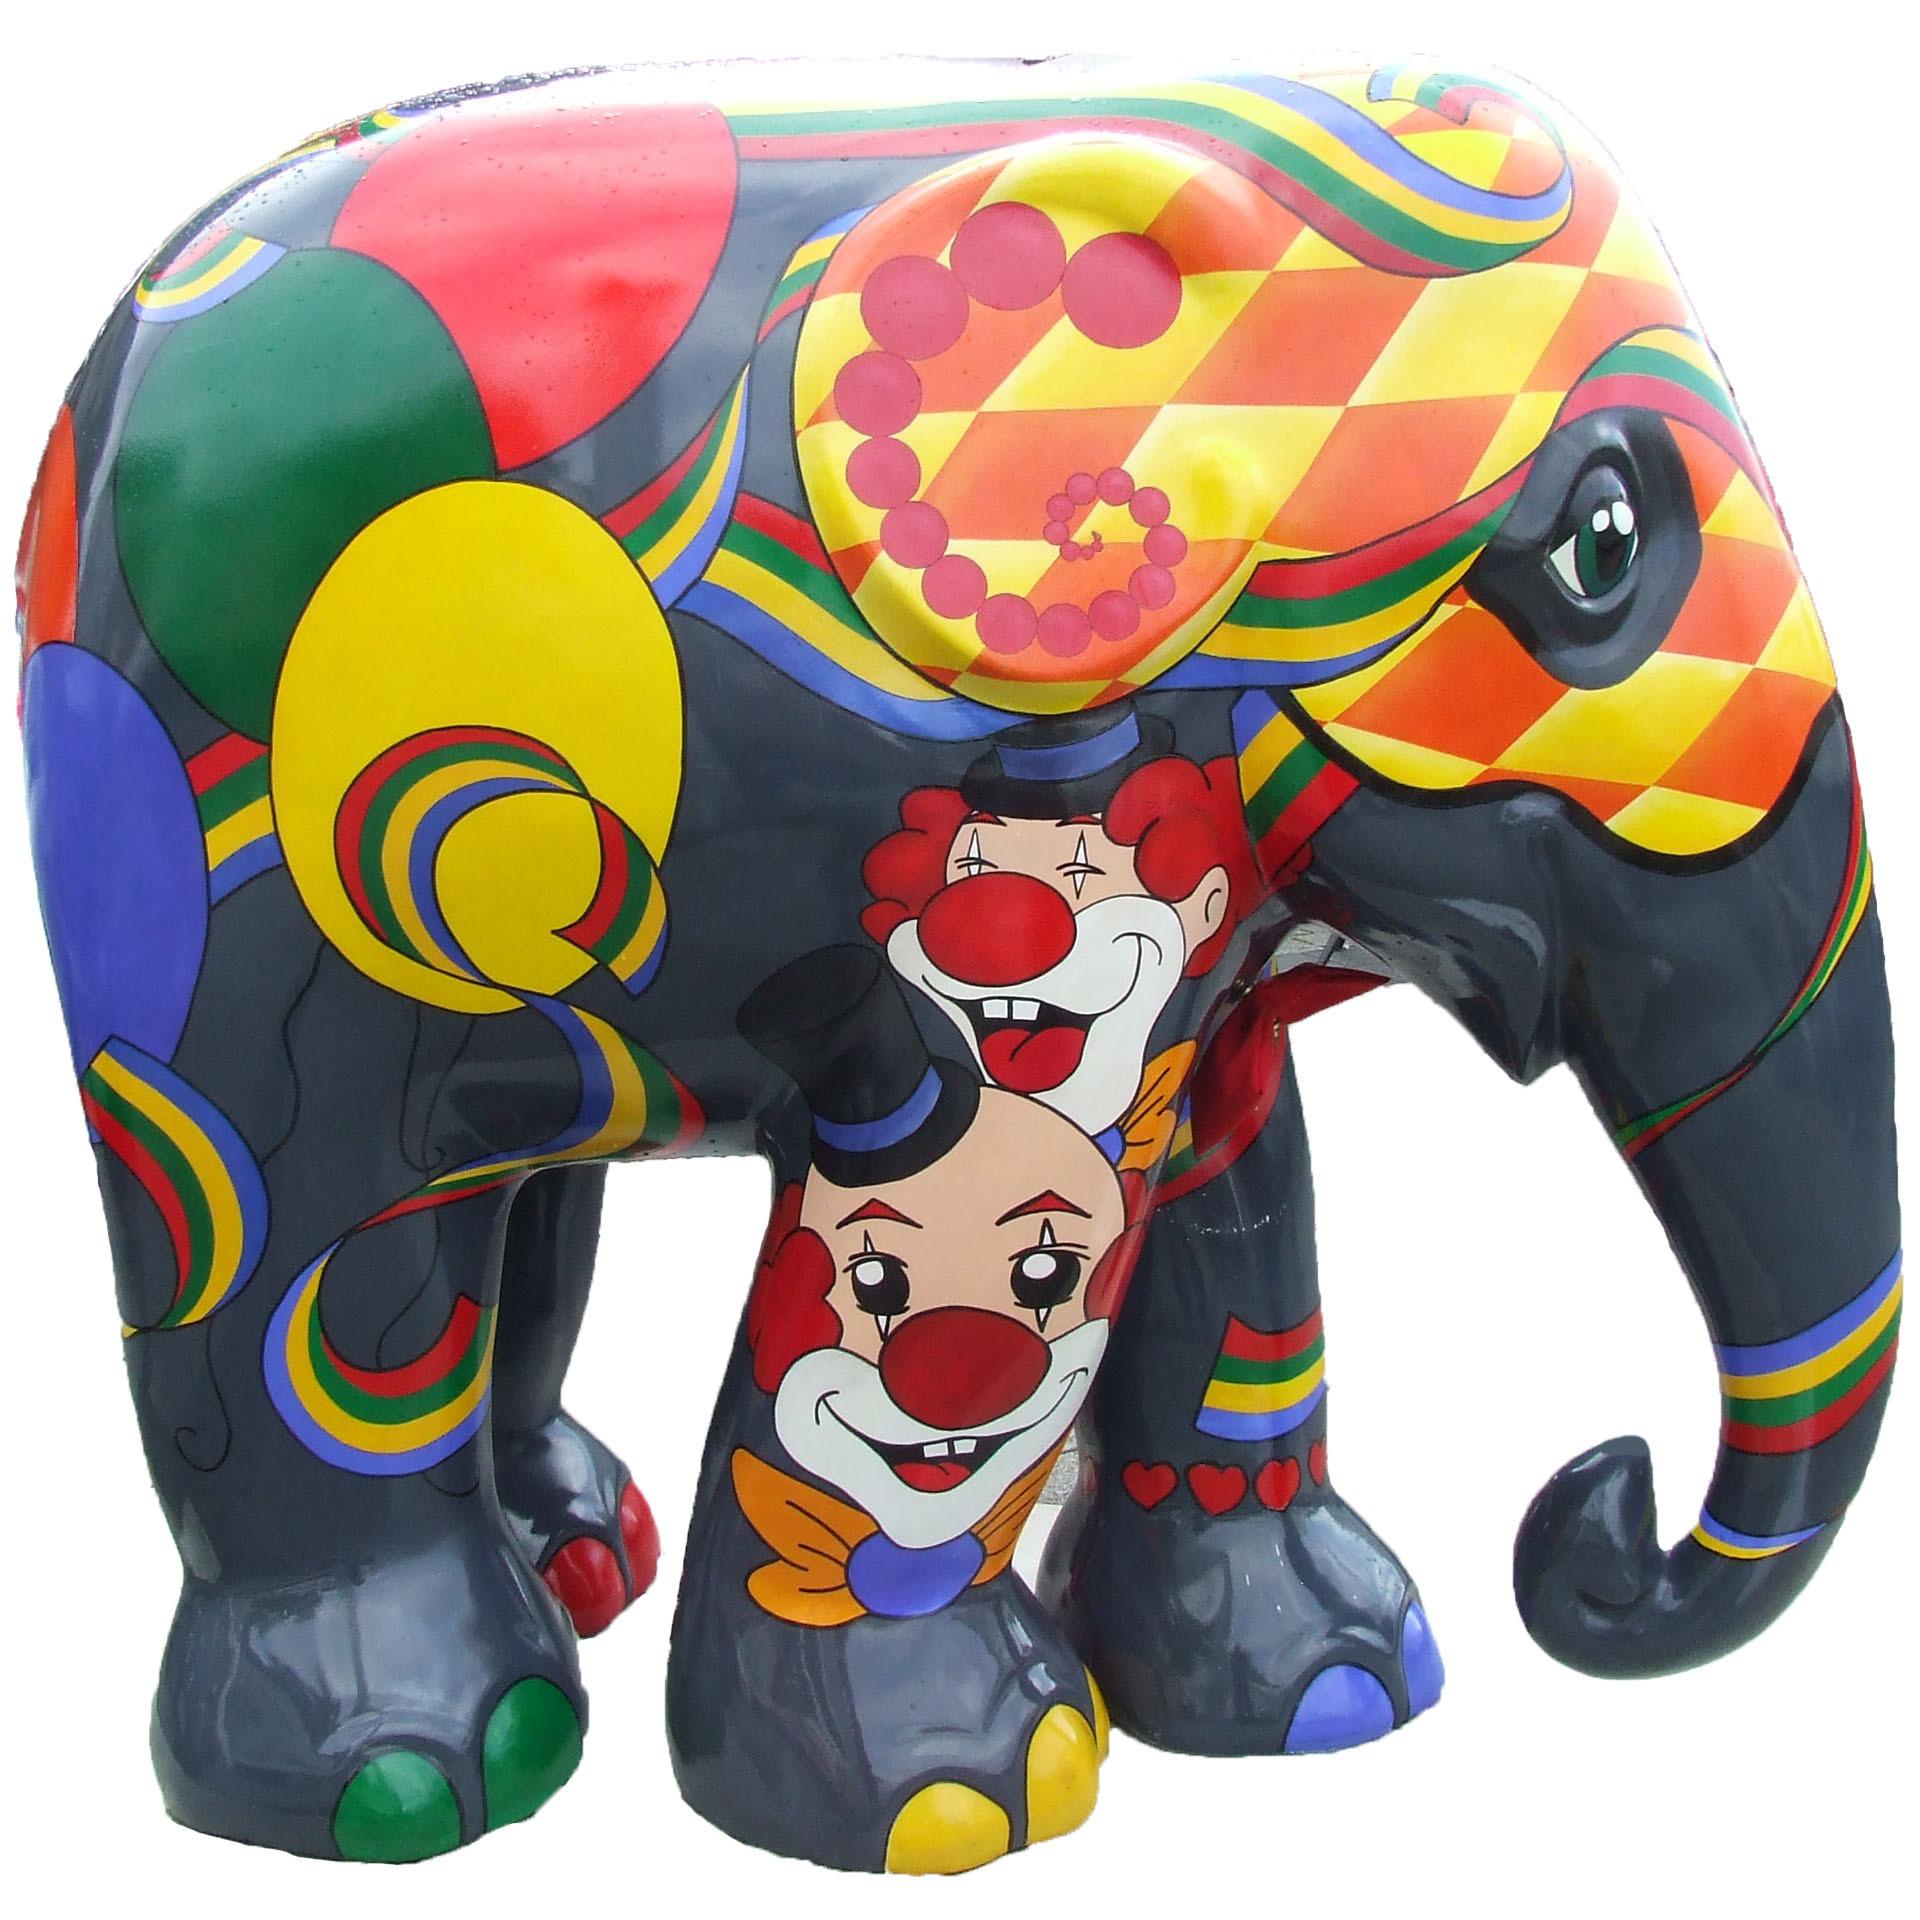 Gambar Bermain Balon Mainan Produk Seni Gambar Kartun Tiup